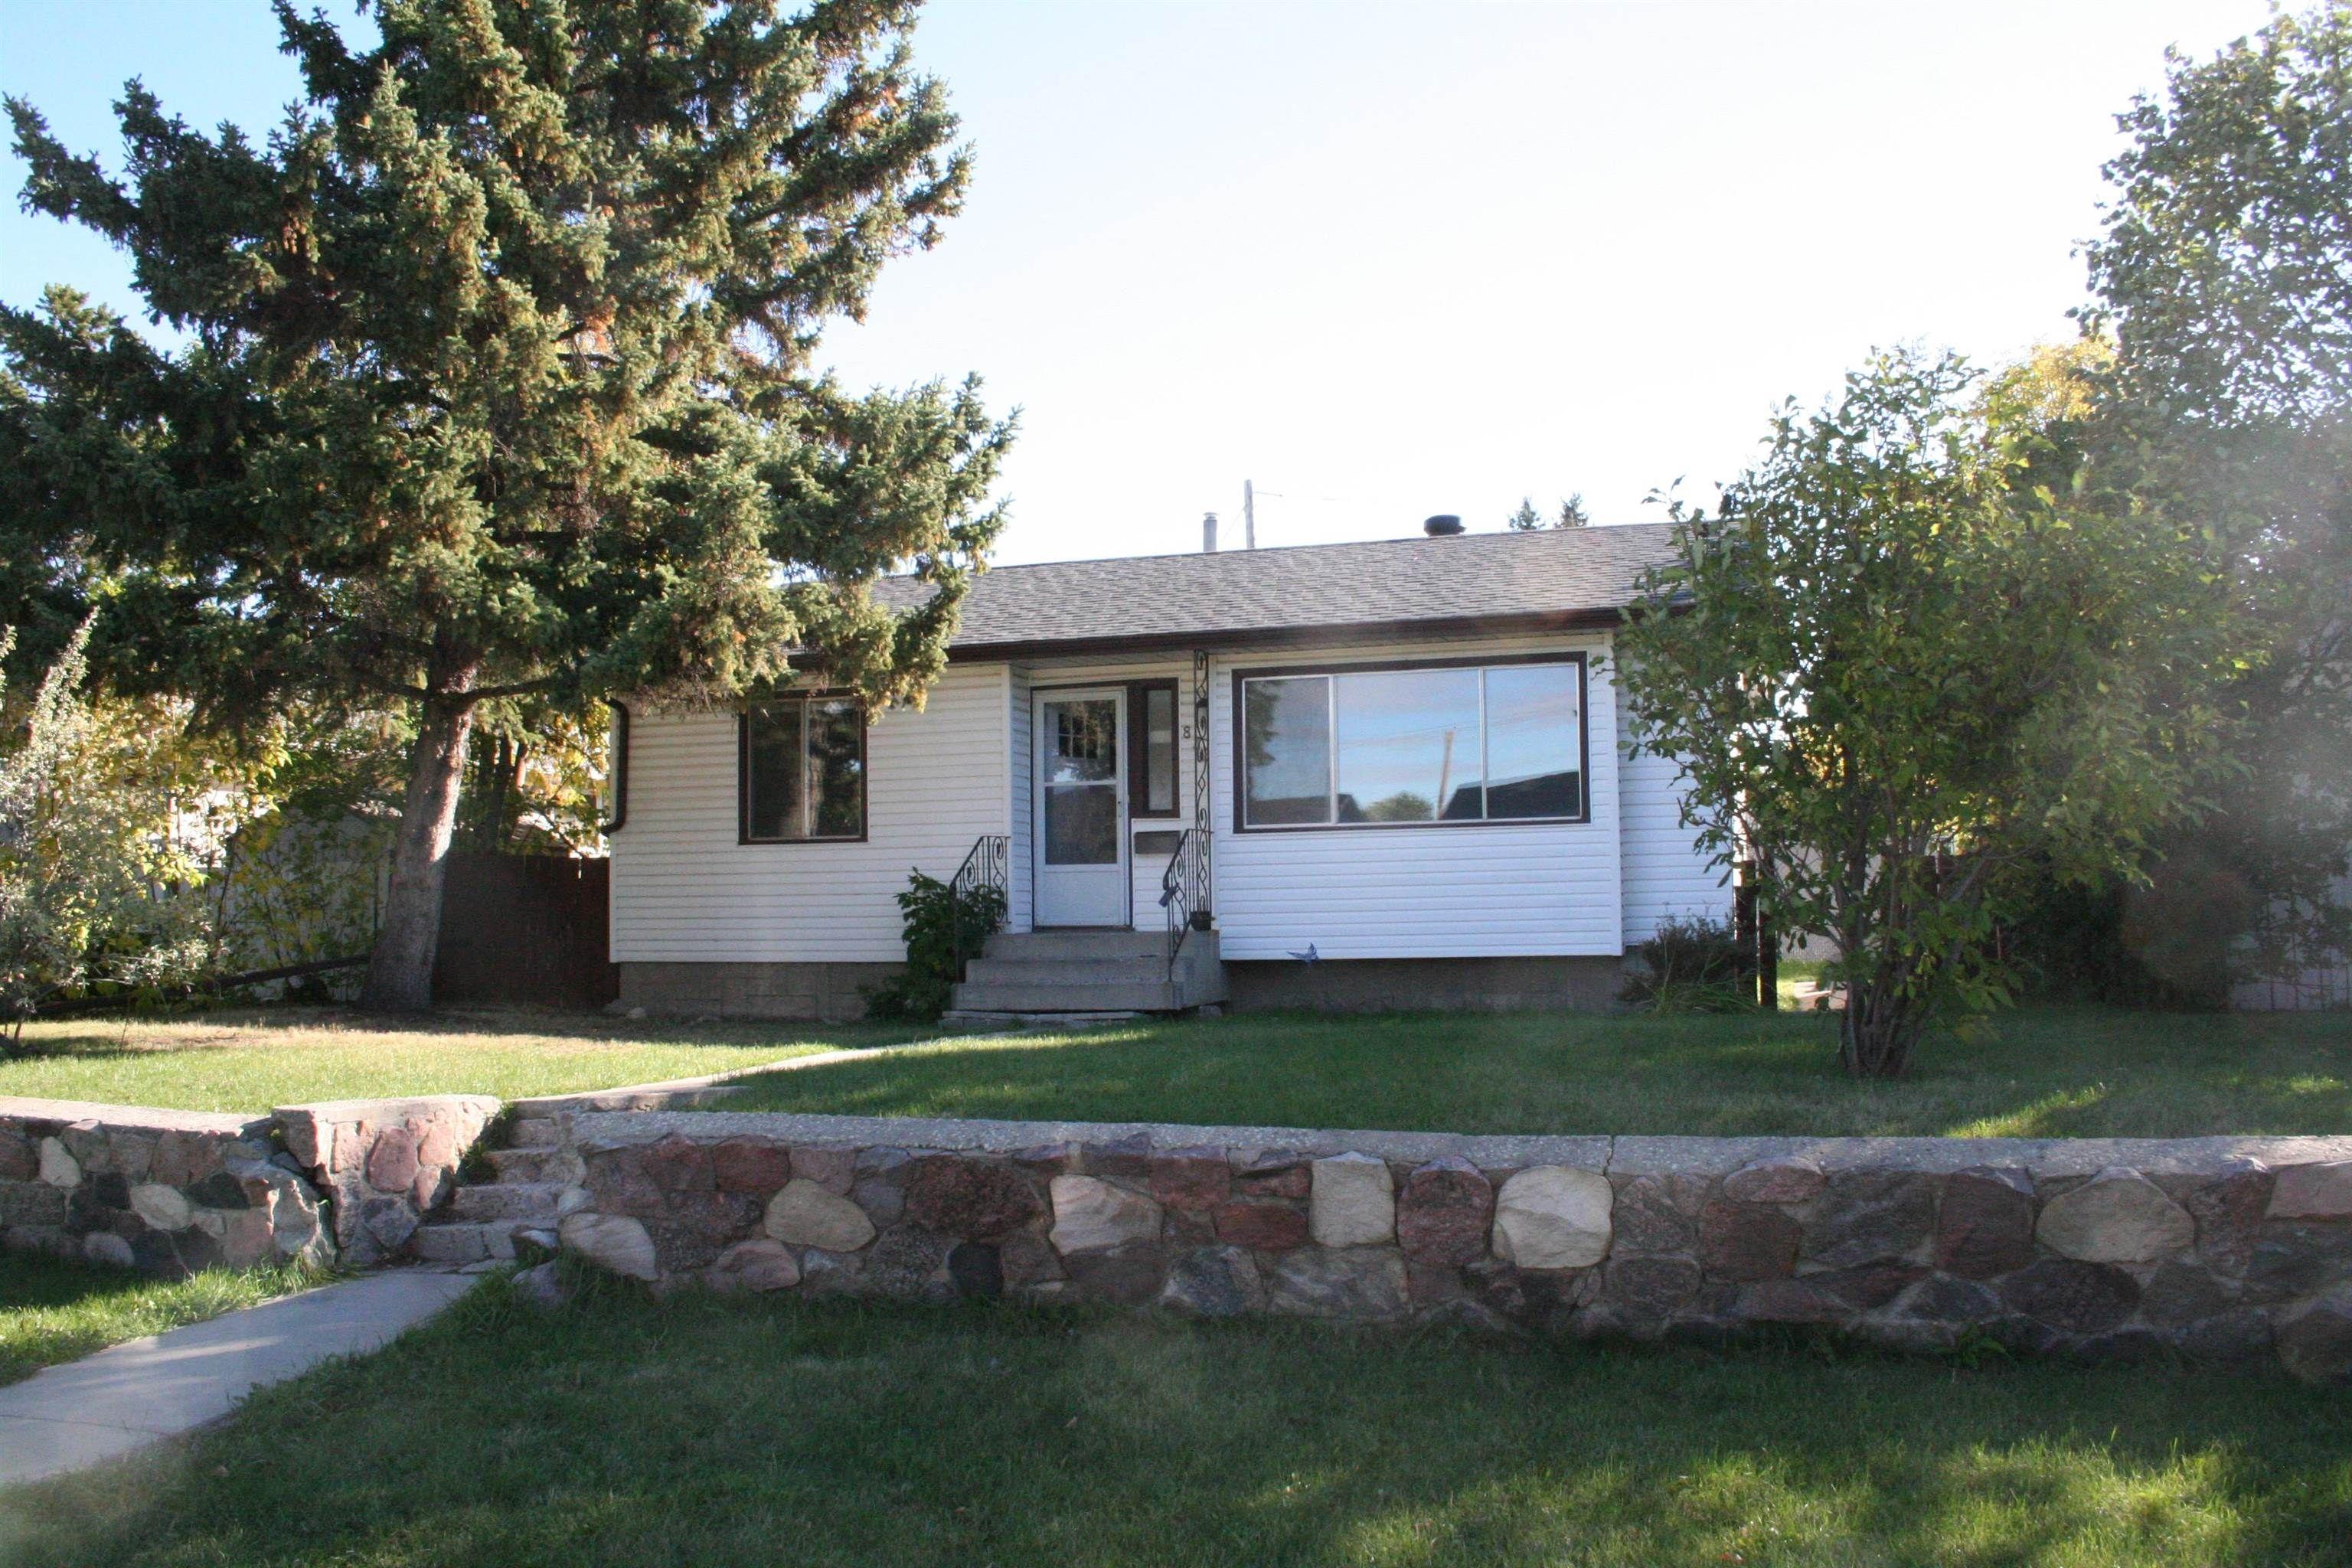 Main Photo: 8329 166 Street in Edmonton: Zone 22 House for sale : MLS®# E4263534